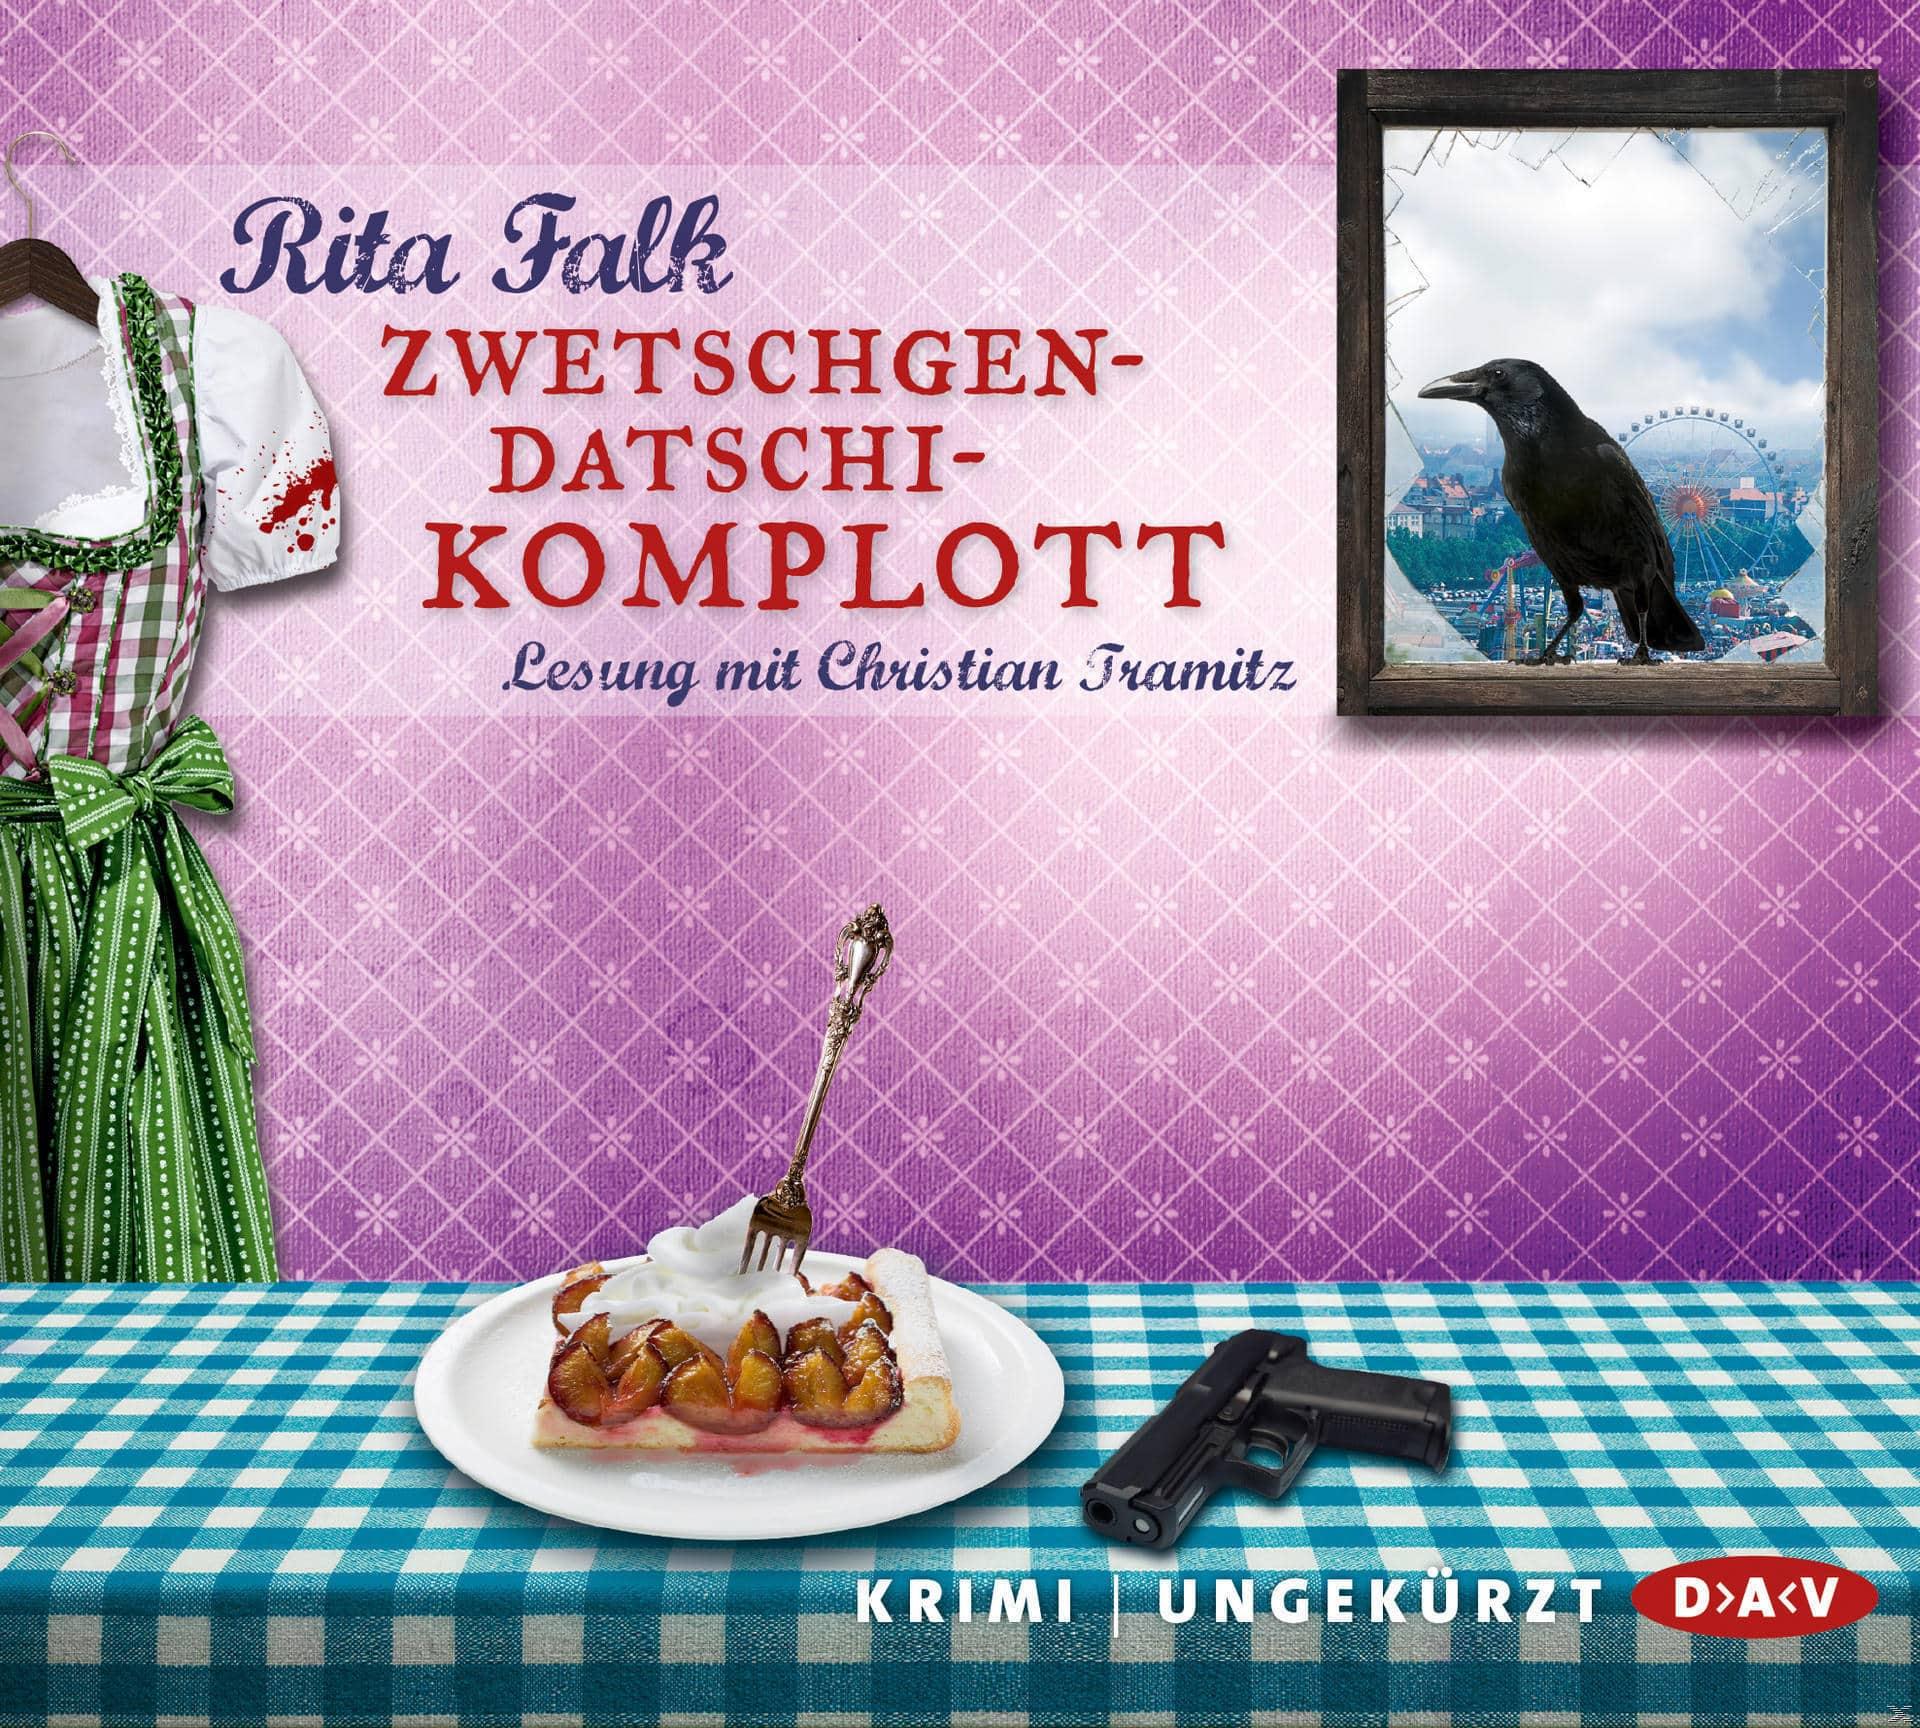 Zwetschgendatschikomplott (CD(s)) für 19,13 Euro